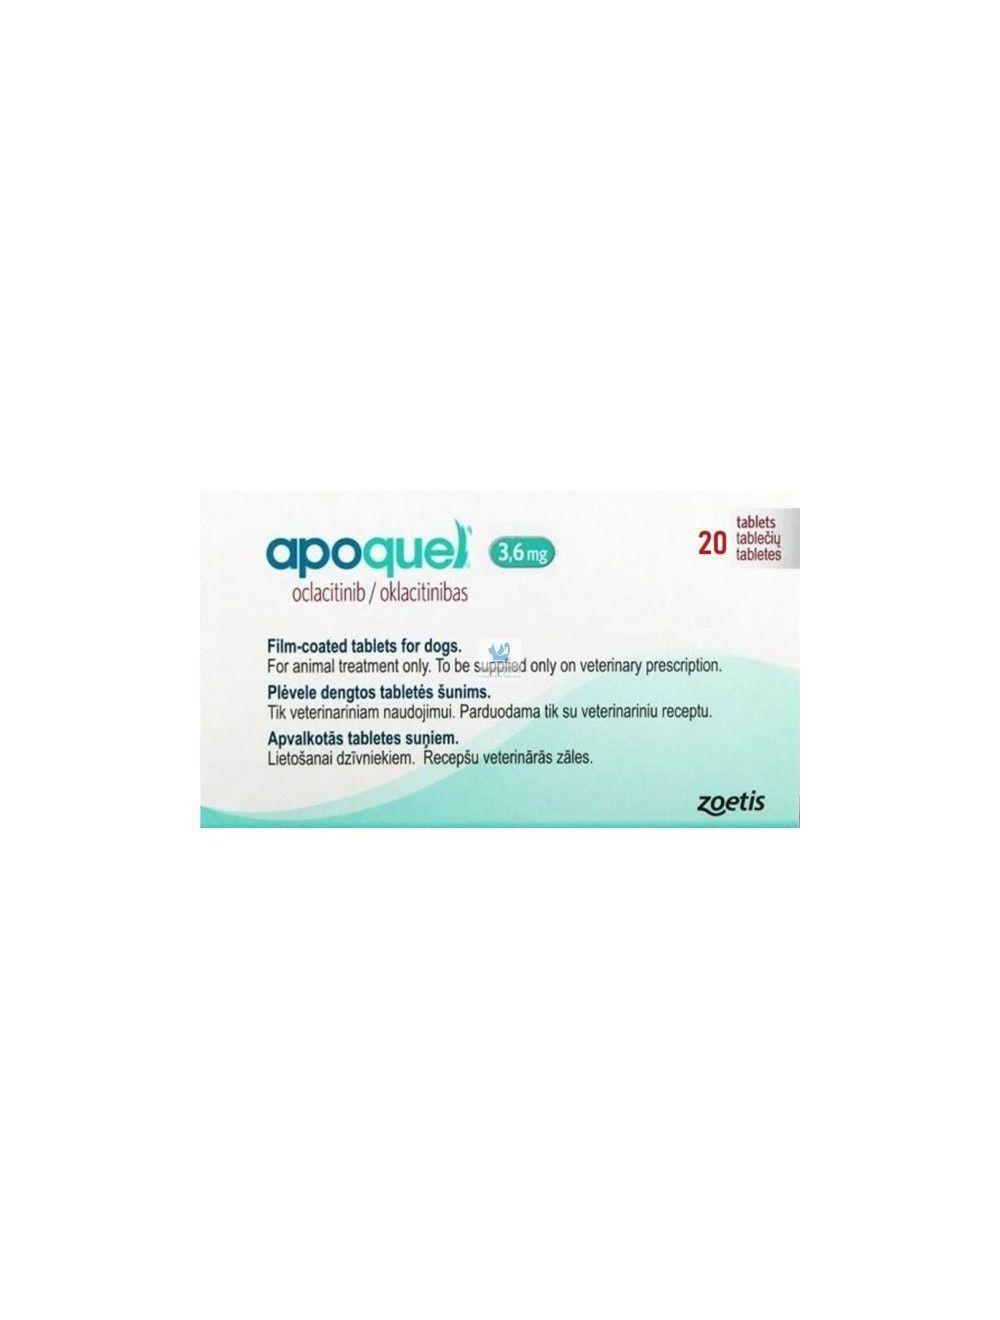 Tratamiento Apoquel  3,6 Mg 20 tab - Ciudaddemascotas.com